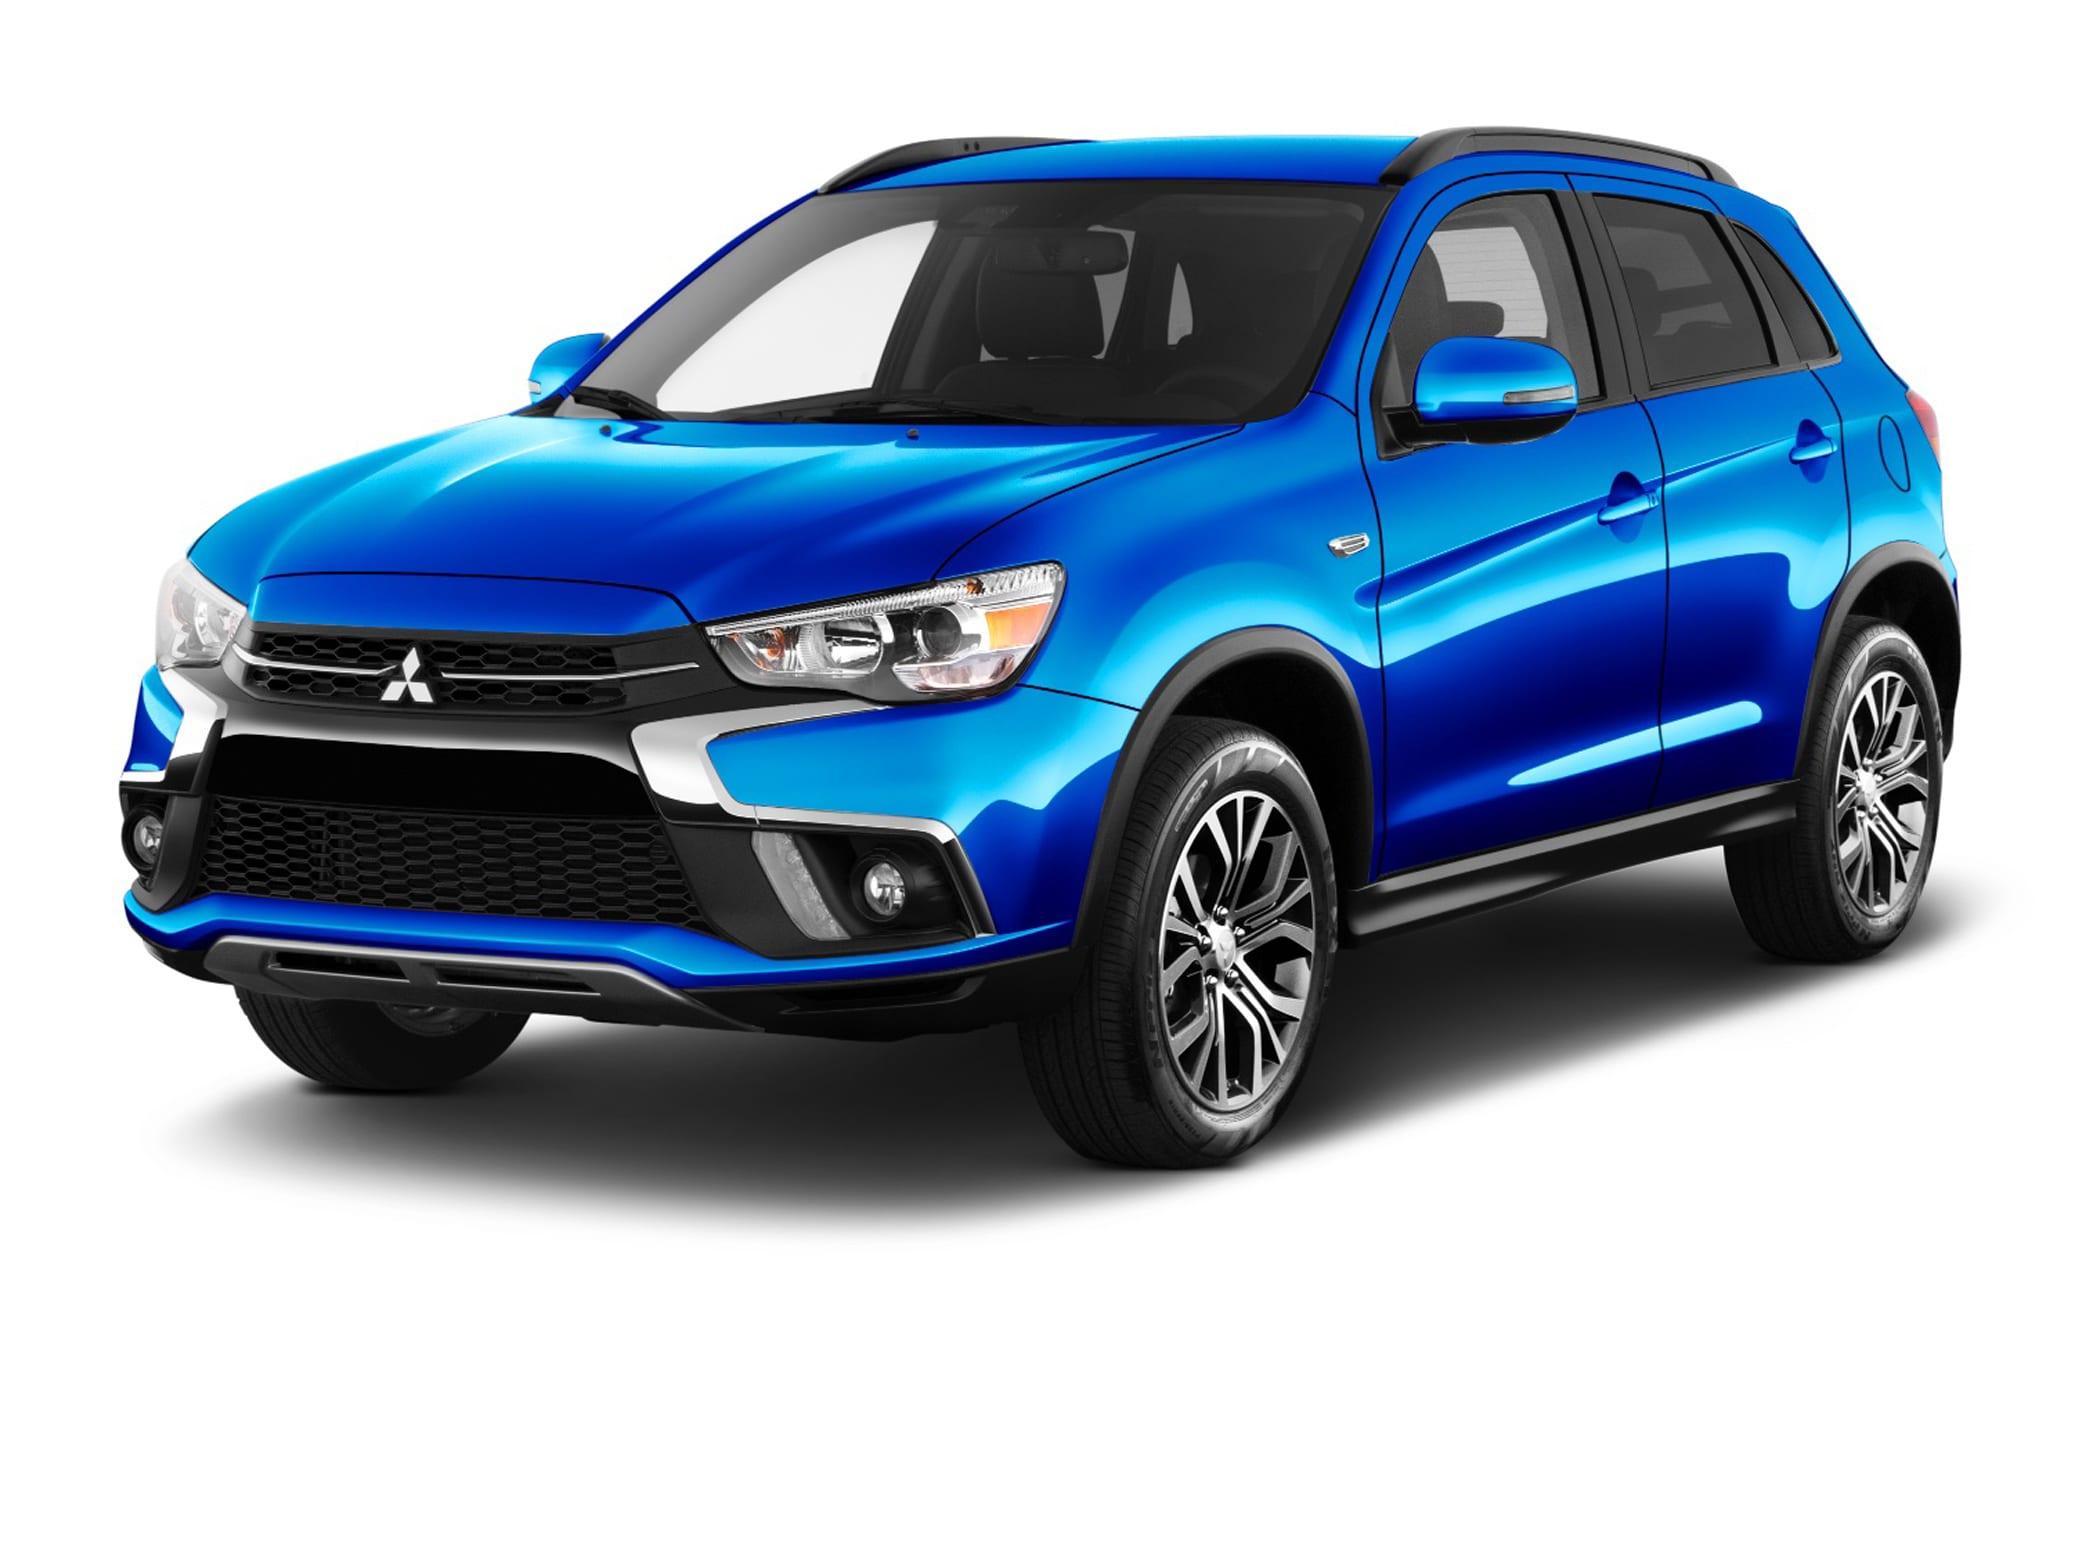 2019 Mitsubishi Outlander Sport CUV Digital Showroom